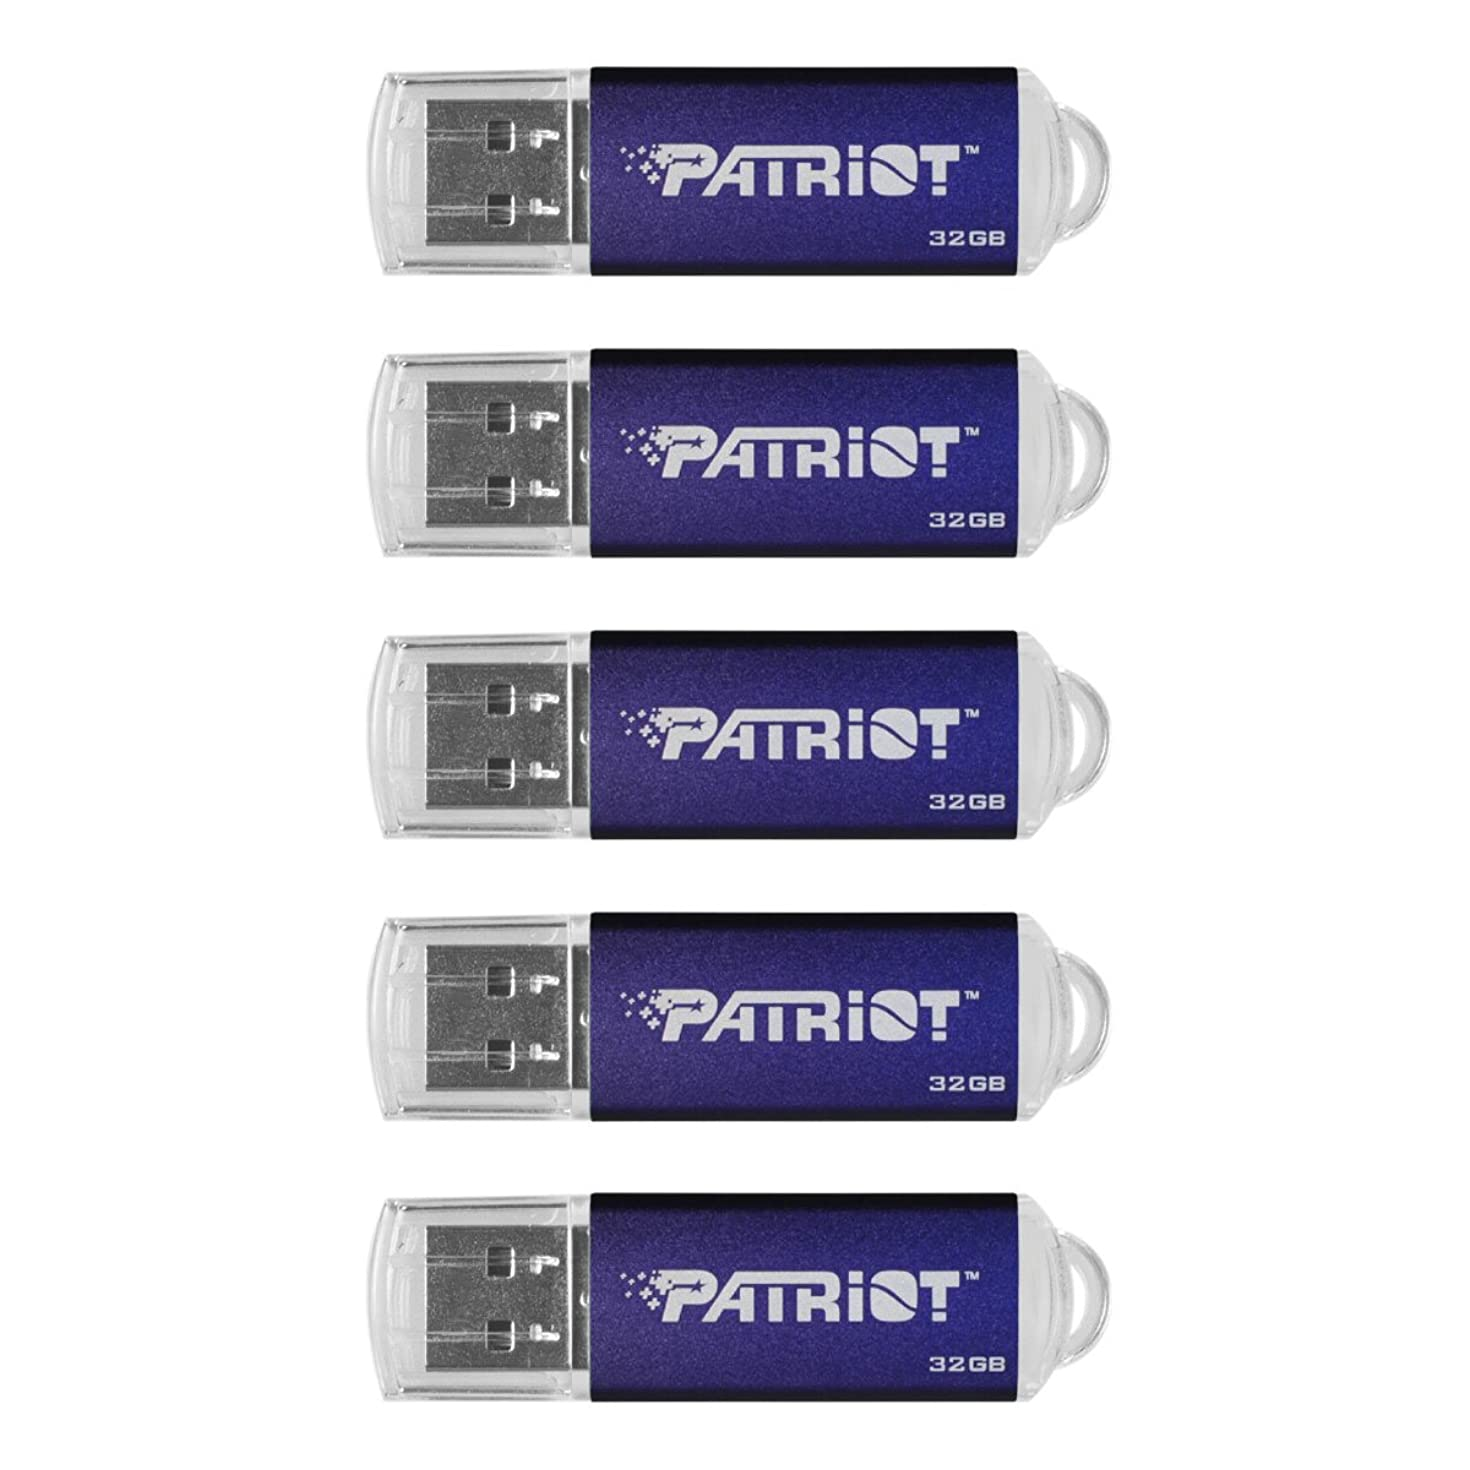 Patriot Memory 32GB Pulse Series USB 2.0 Flash Drive - 5 Pack - Blue (PSF32GXPPN5PK)